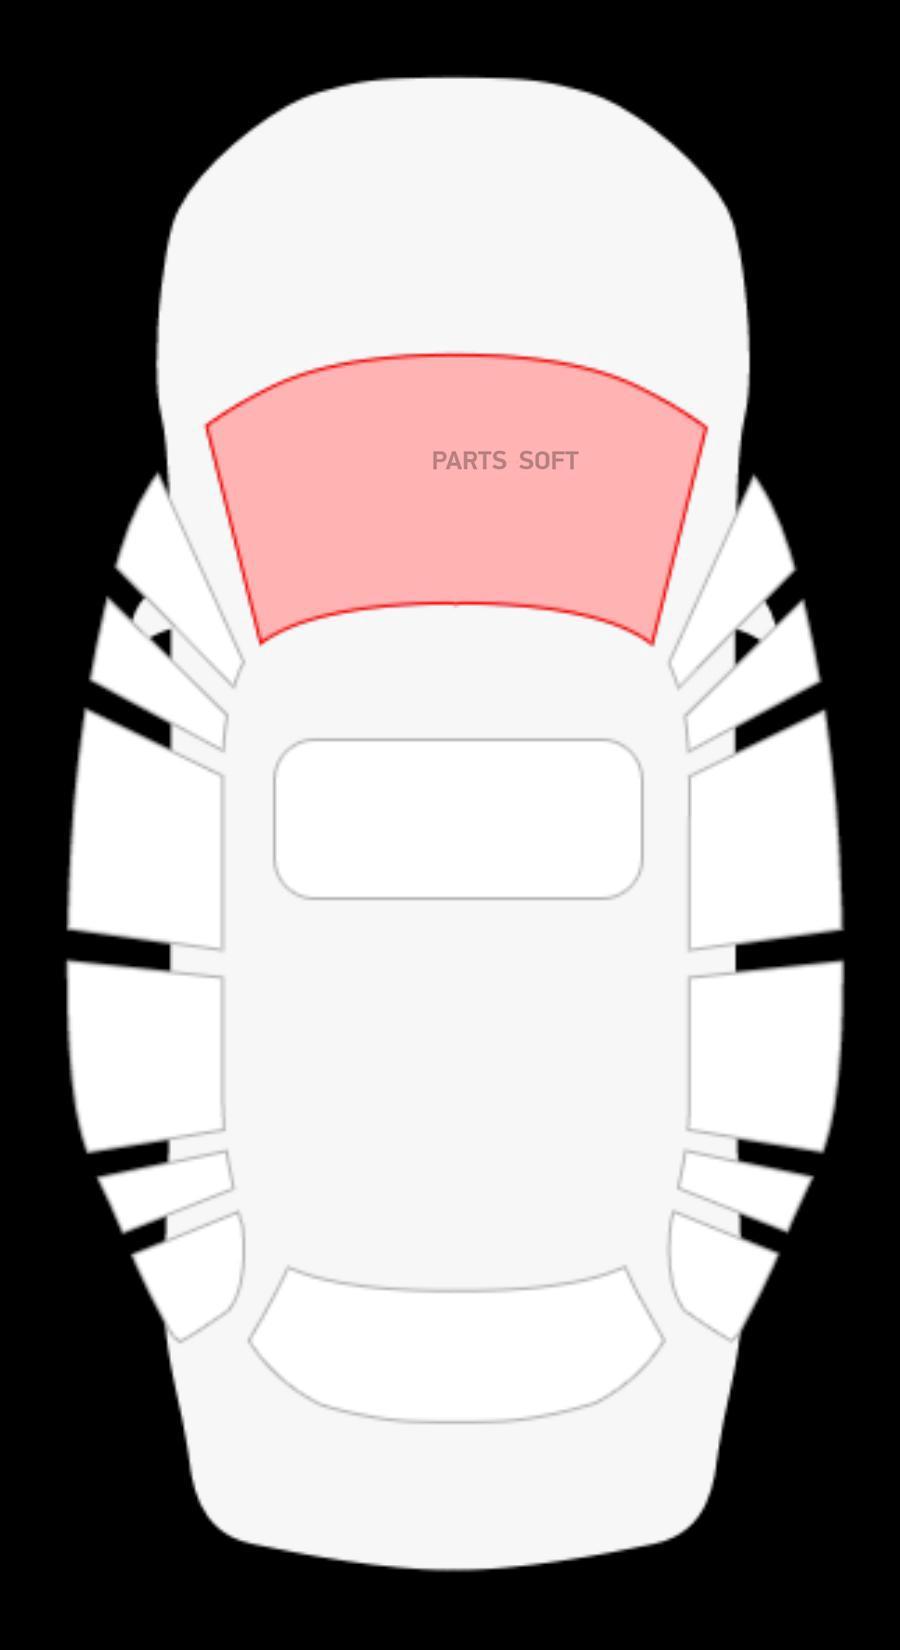 Honda Accord 4D седан / 5D Stw с ом (верх)